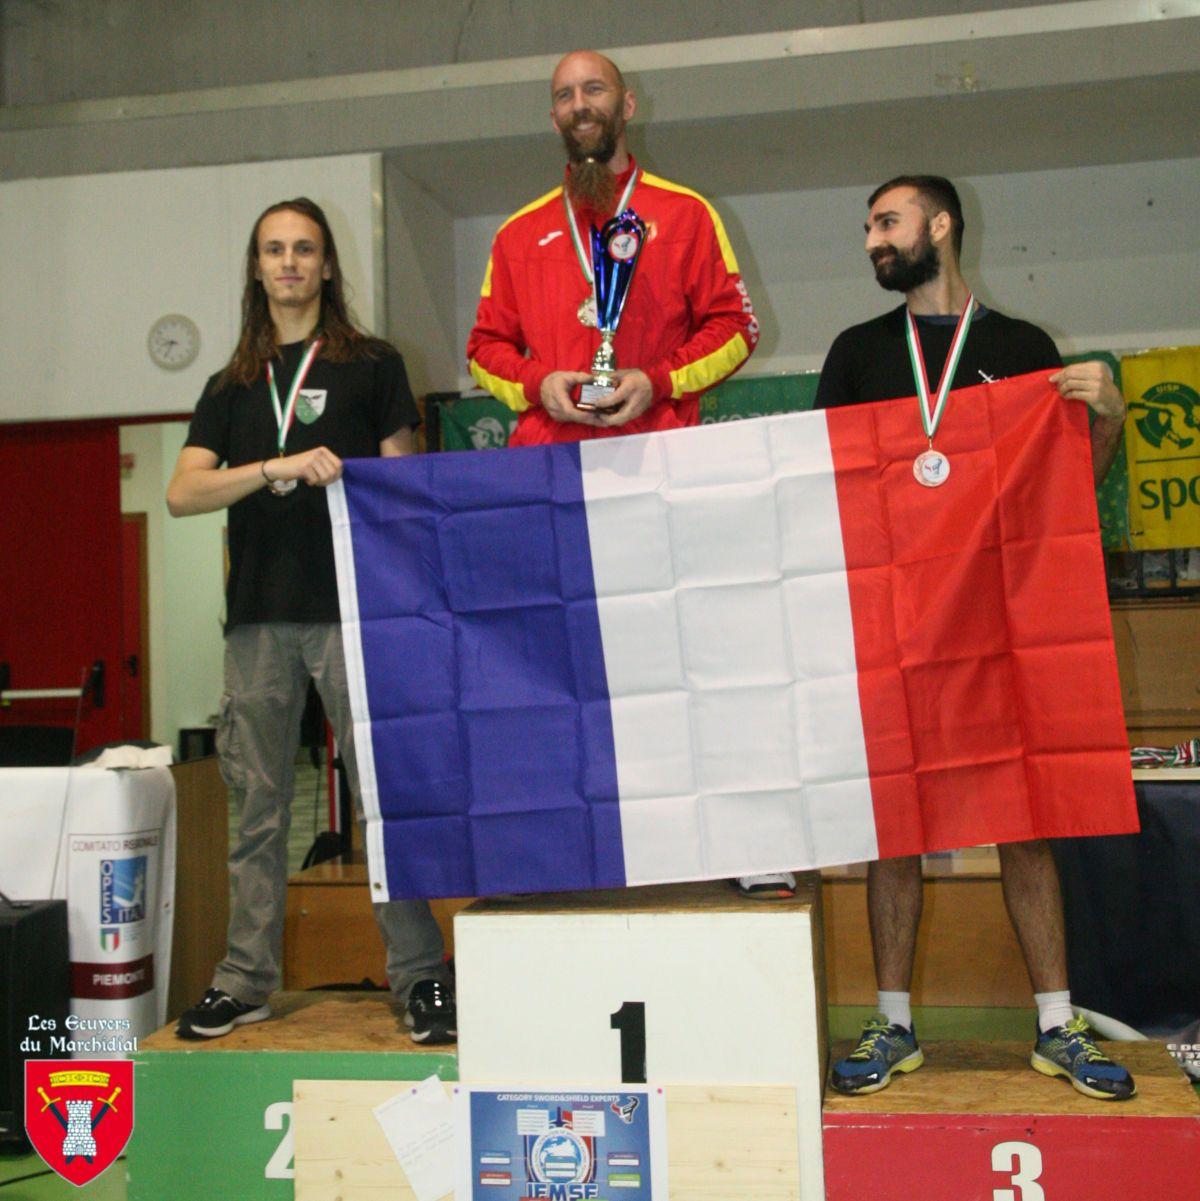 2017-11-17-Tournoi-MSF-Turin-15-marchidial.fr_